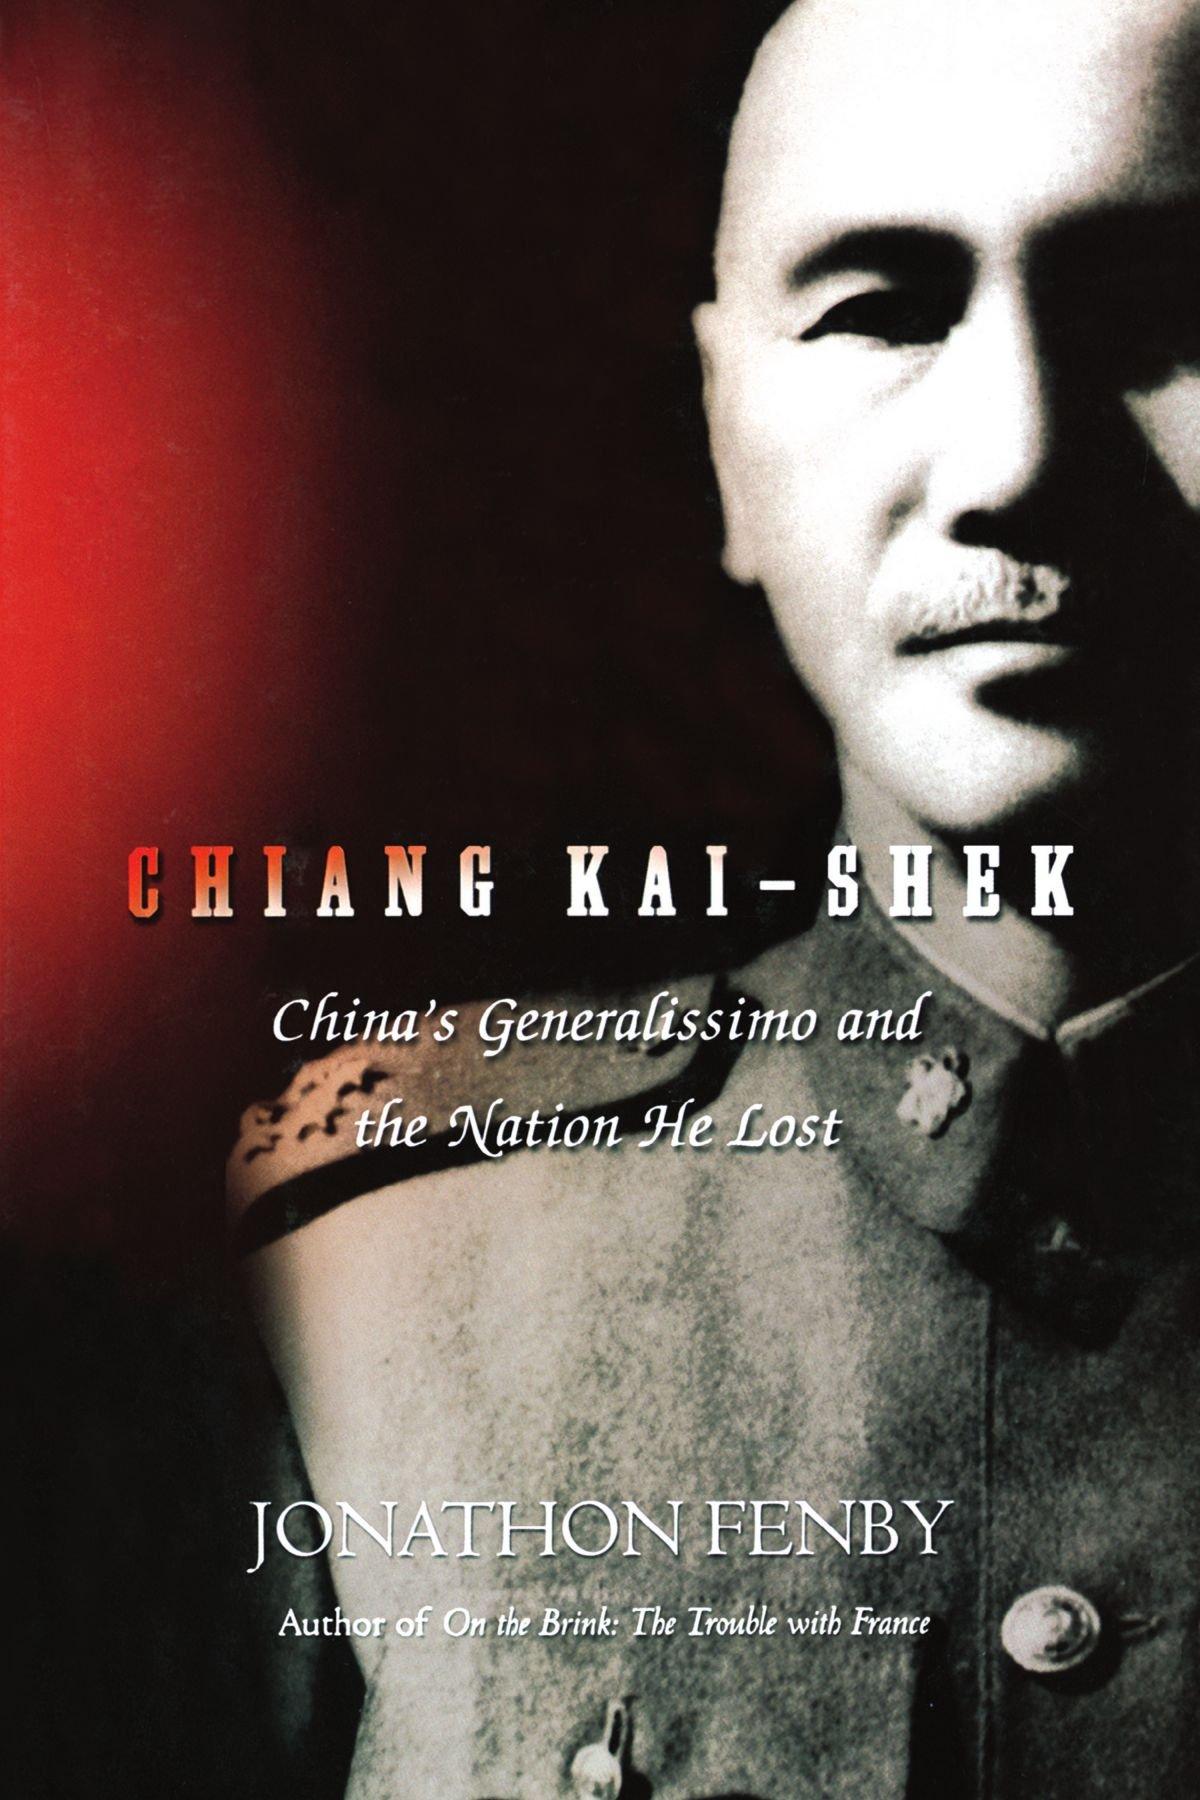 Amazon: Chiang Kai Shek: China's Generalissimo And The Nation He Lost  (9780786714841): Jonathan Fenby: Books